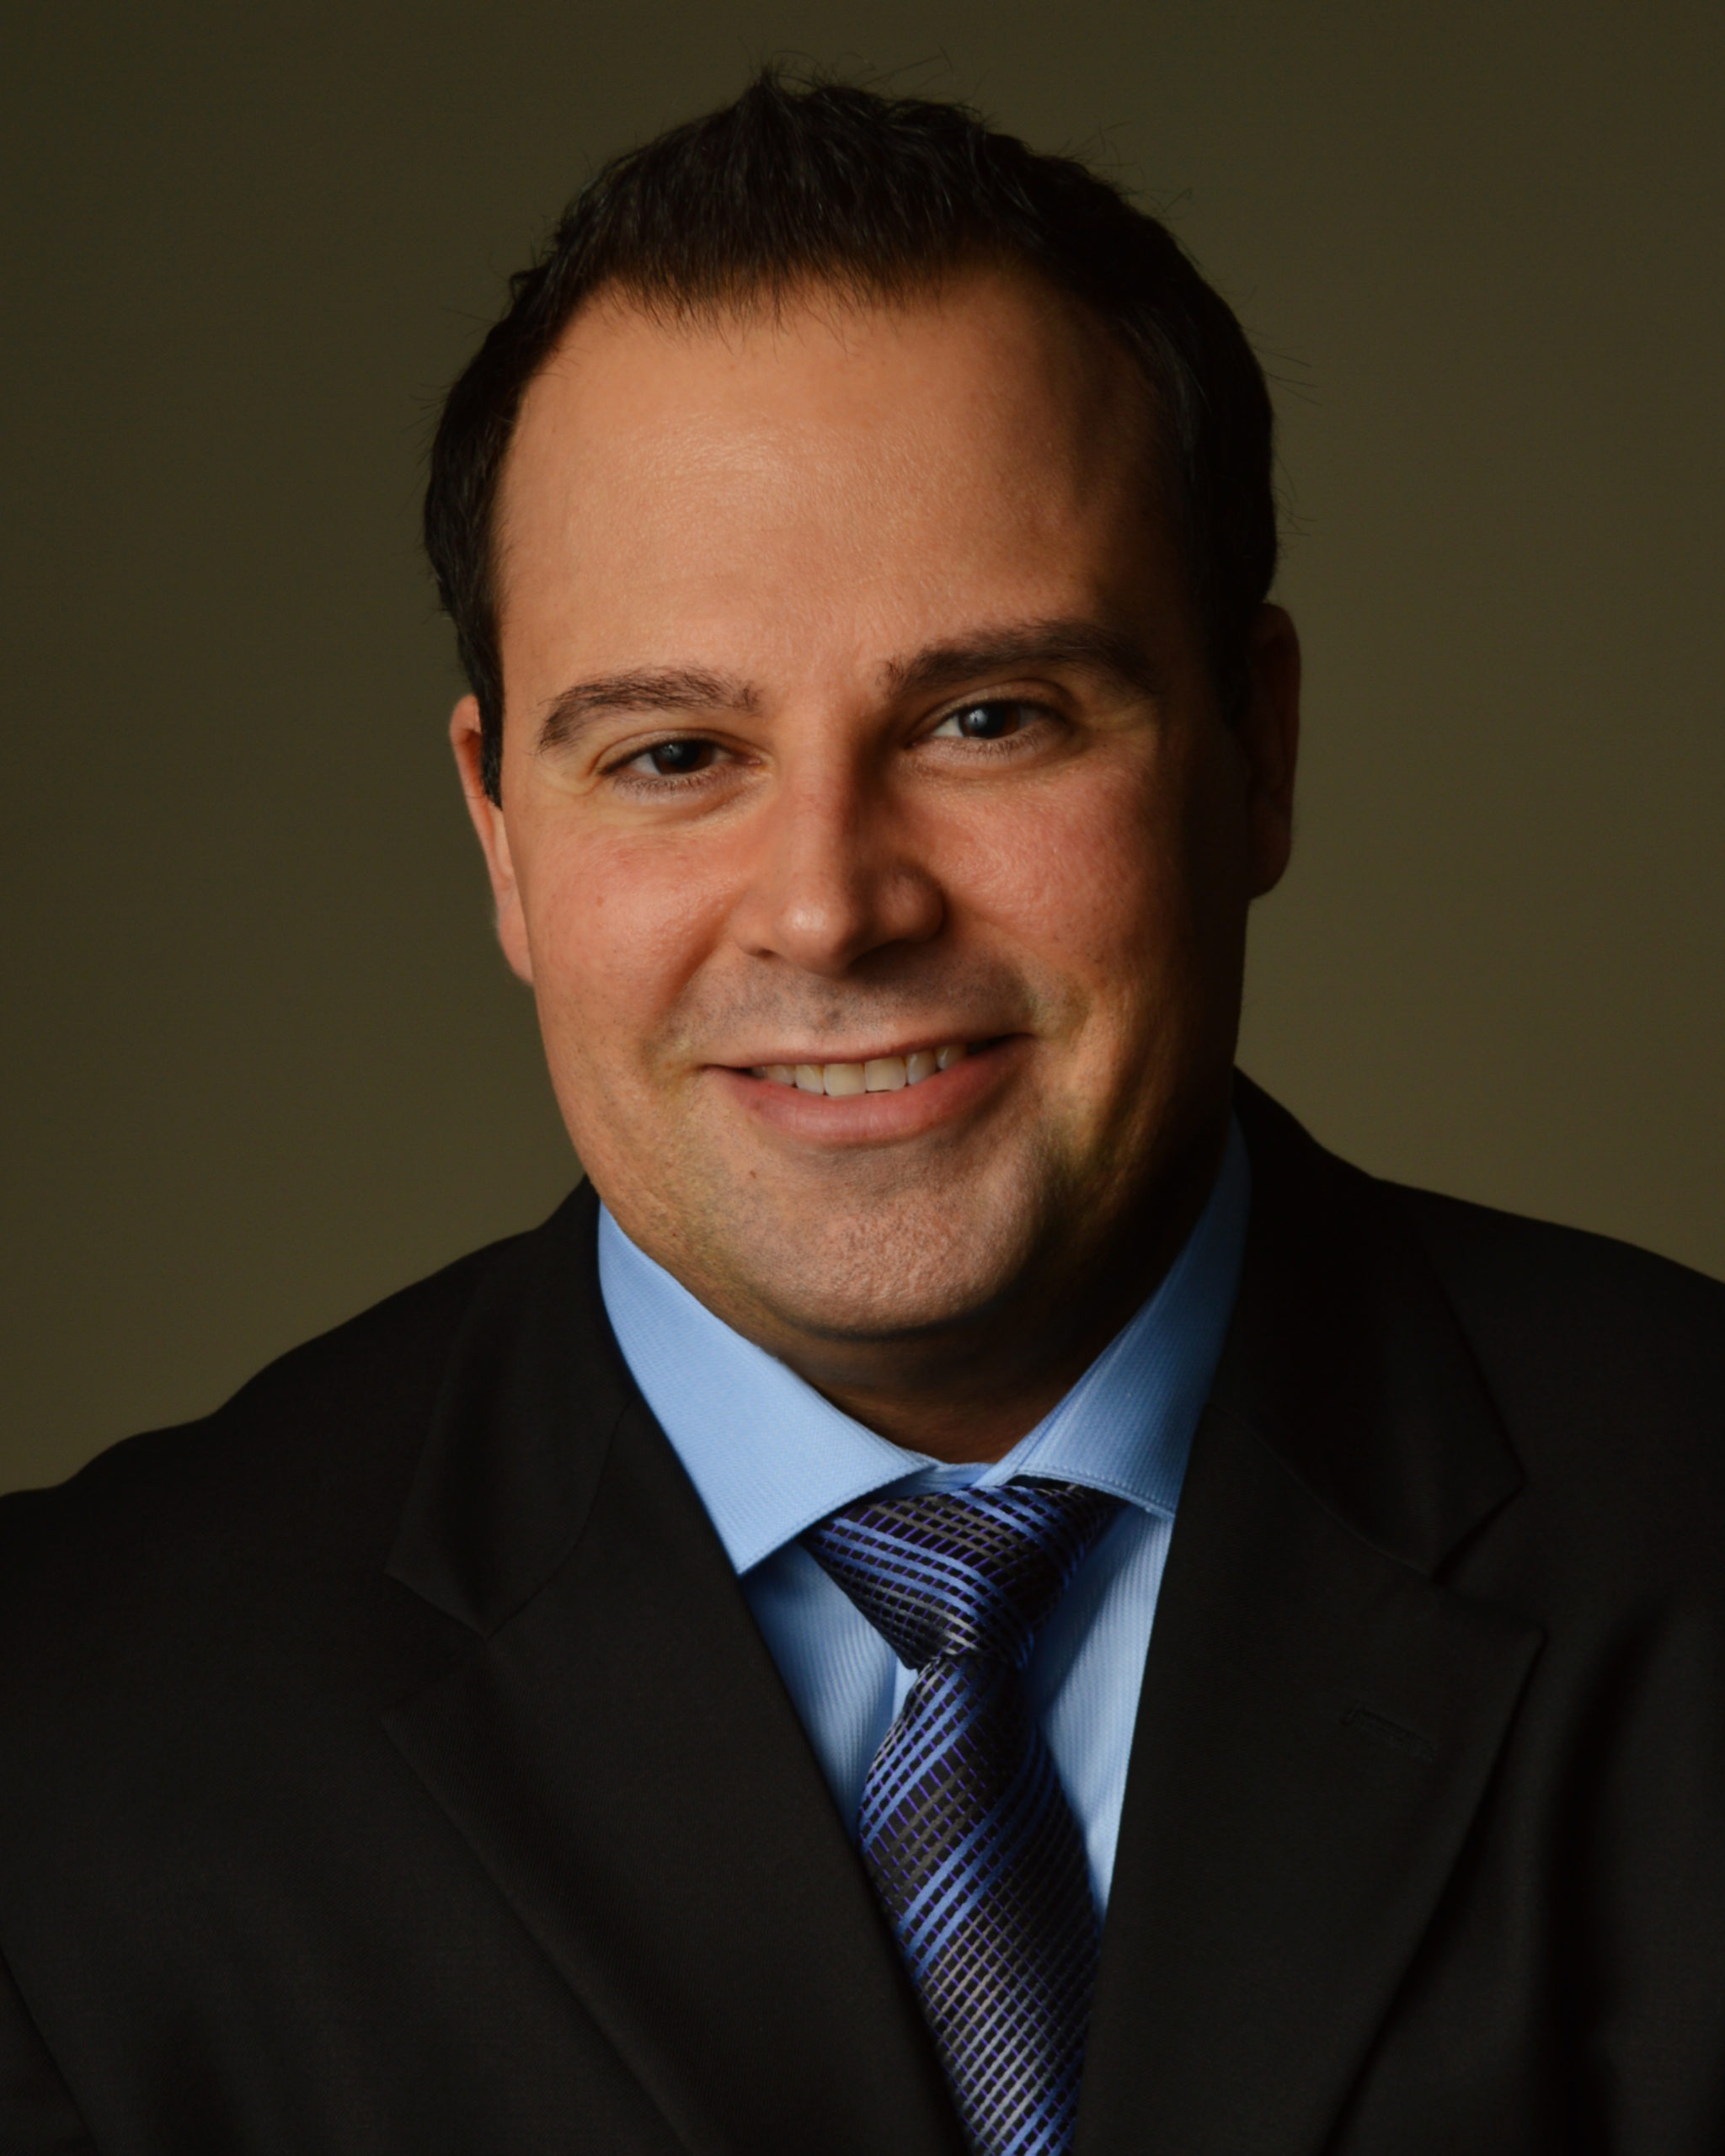 Dr Michael Jurgelewicz